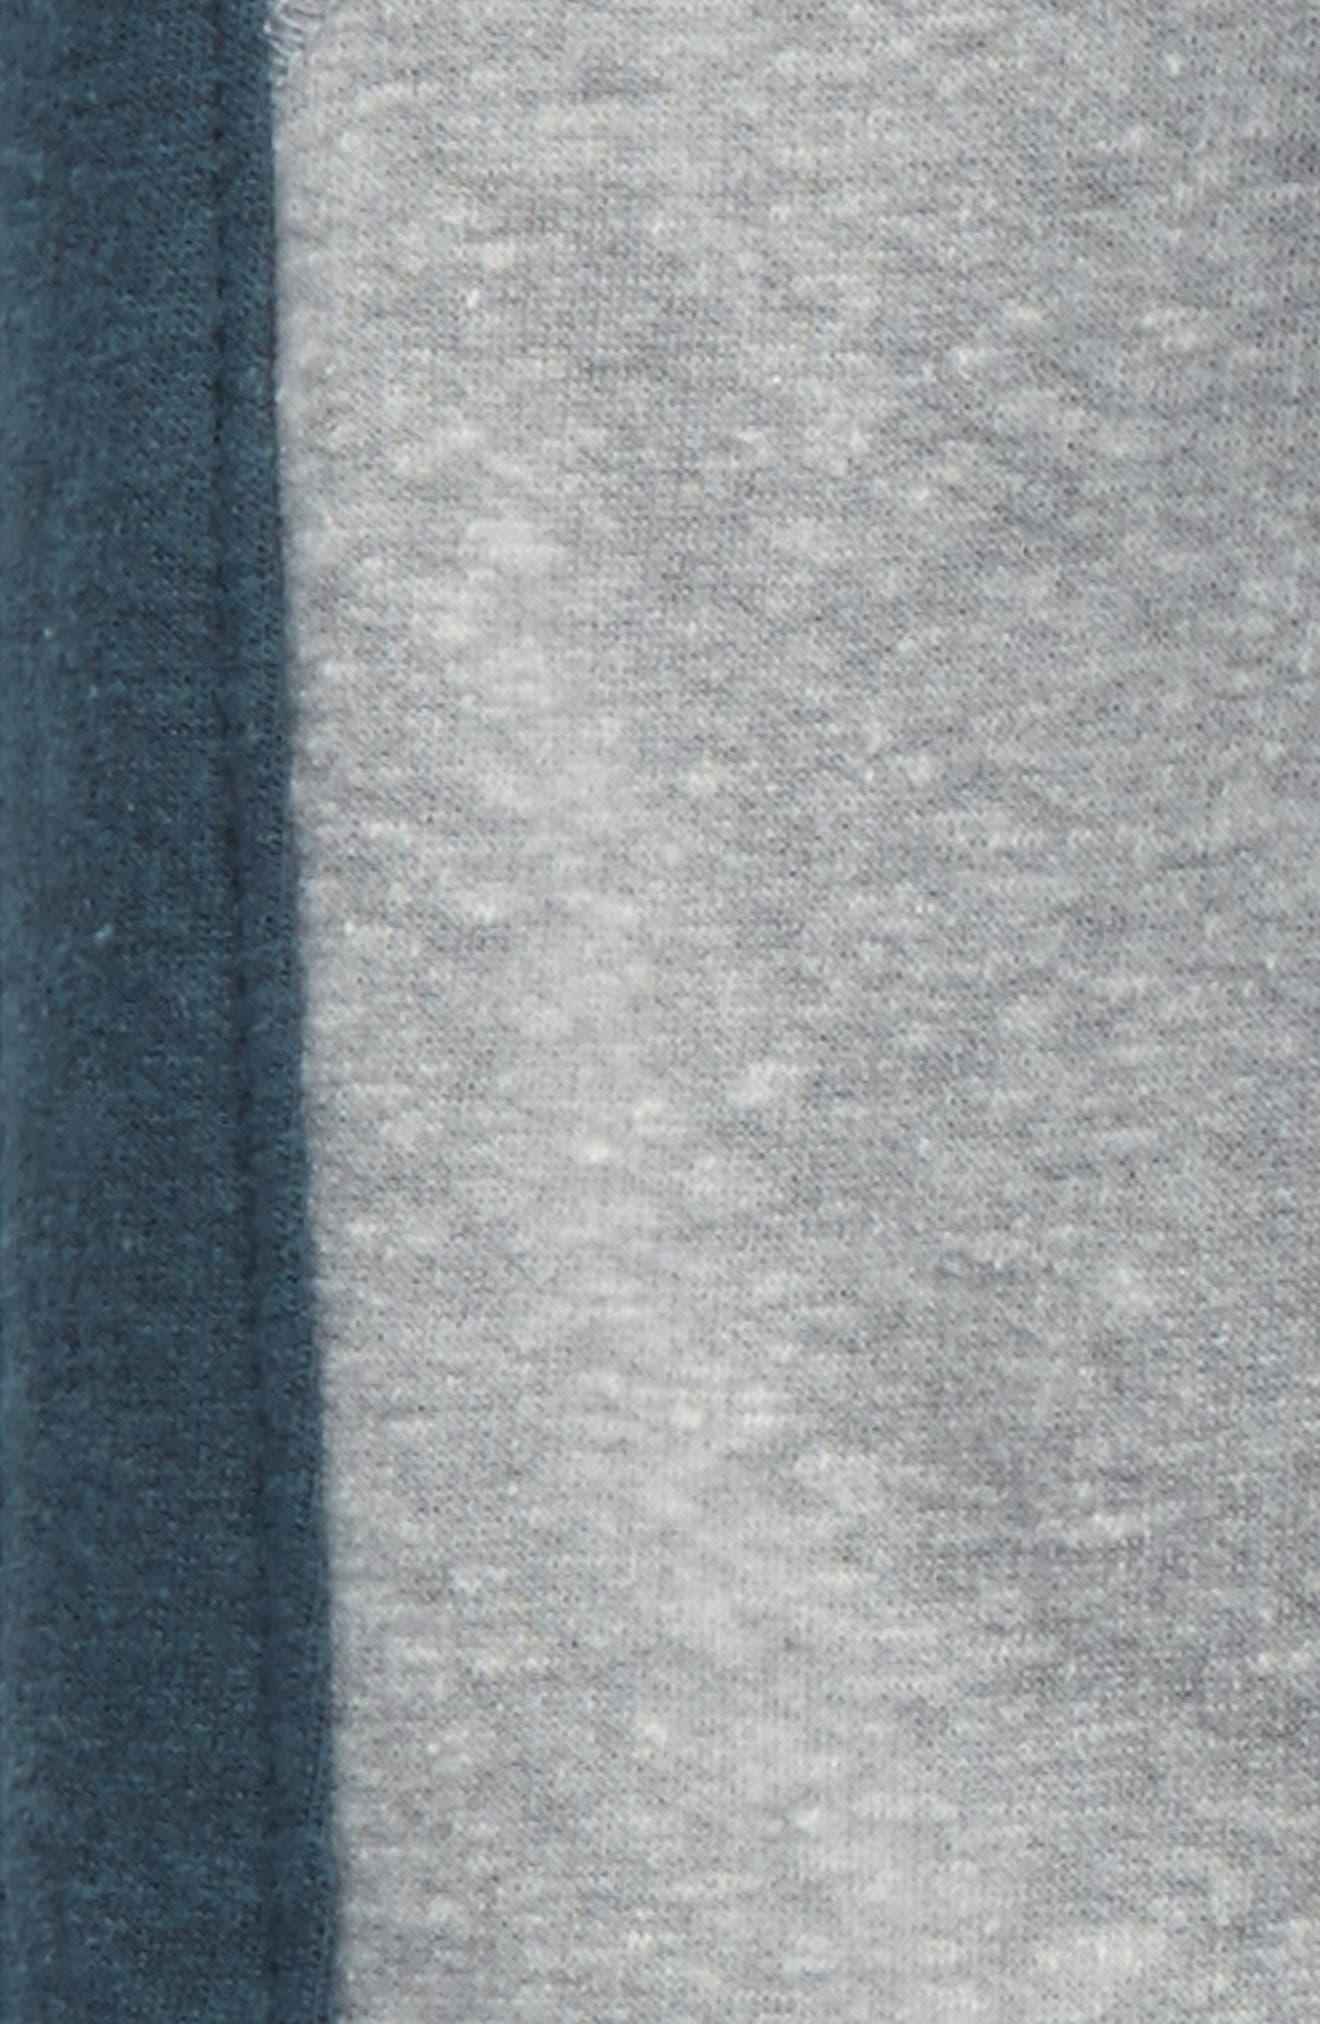 Varsity Sweatpants,                             Alternate thumbnail 2, color,                             030